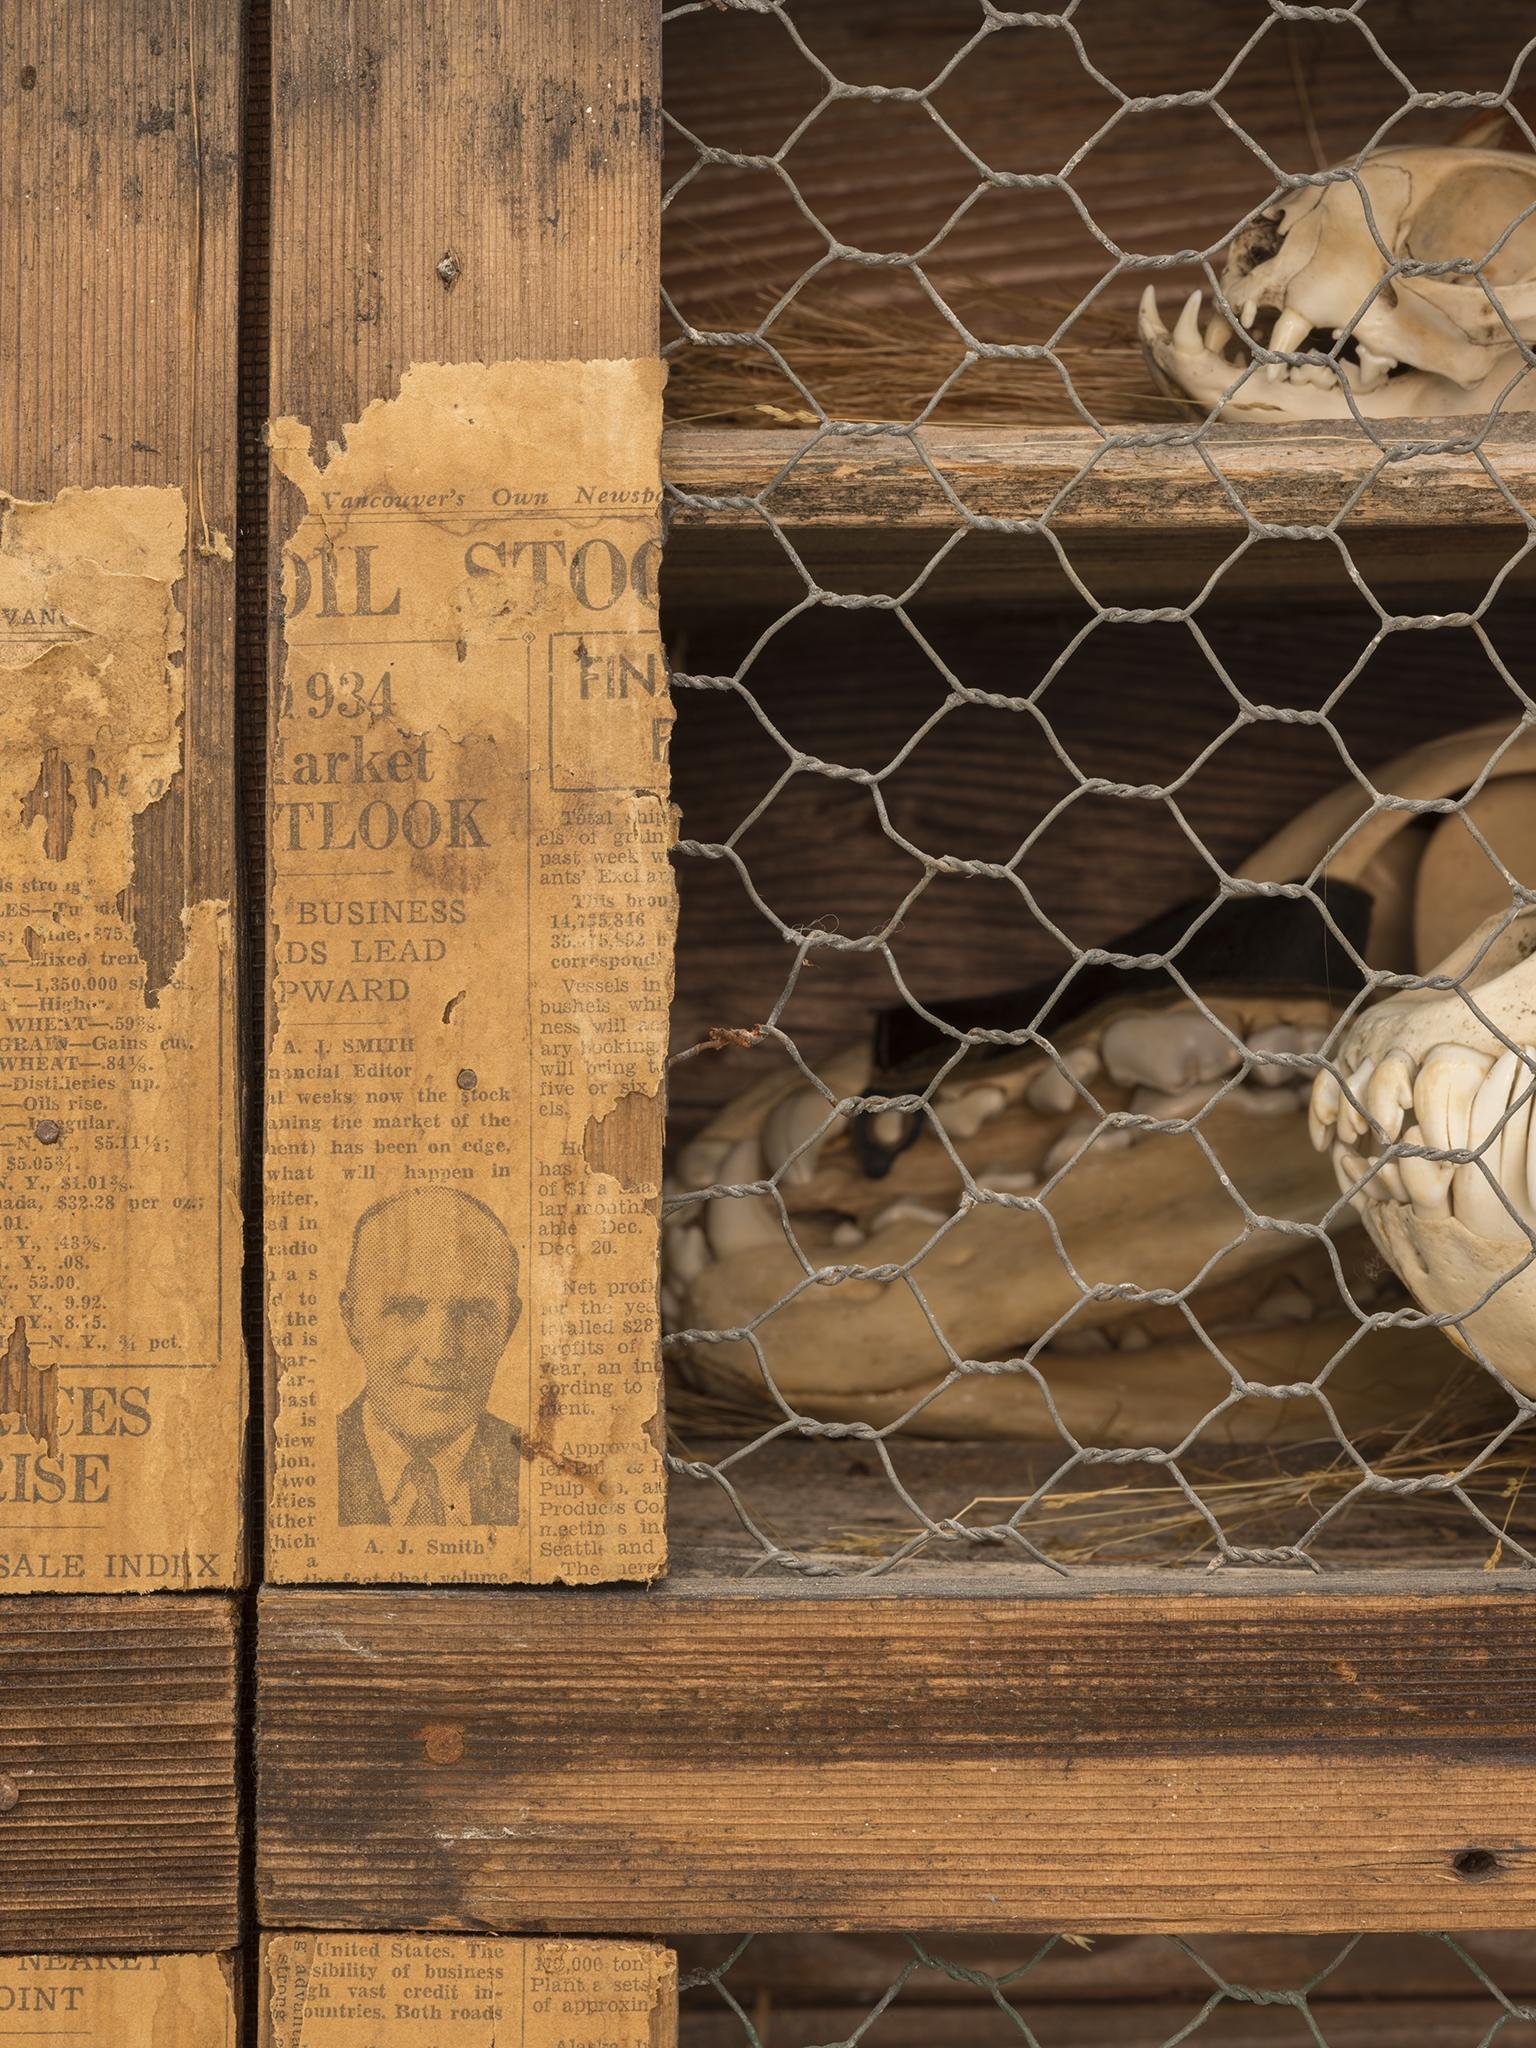 Liz Magor, The Hutch (detail), 1976, natural materials, wood, bones, 33 x 38 x 15 in. (84 x 97 x 38 cm) by